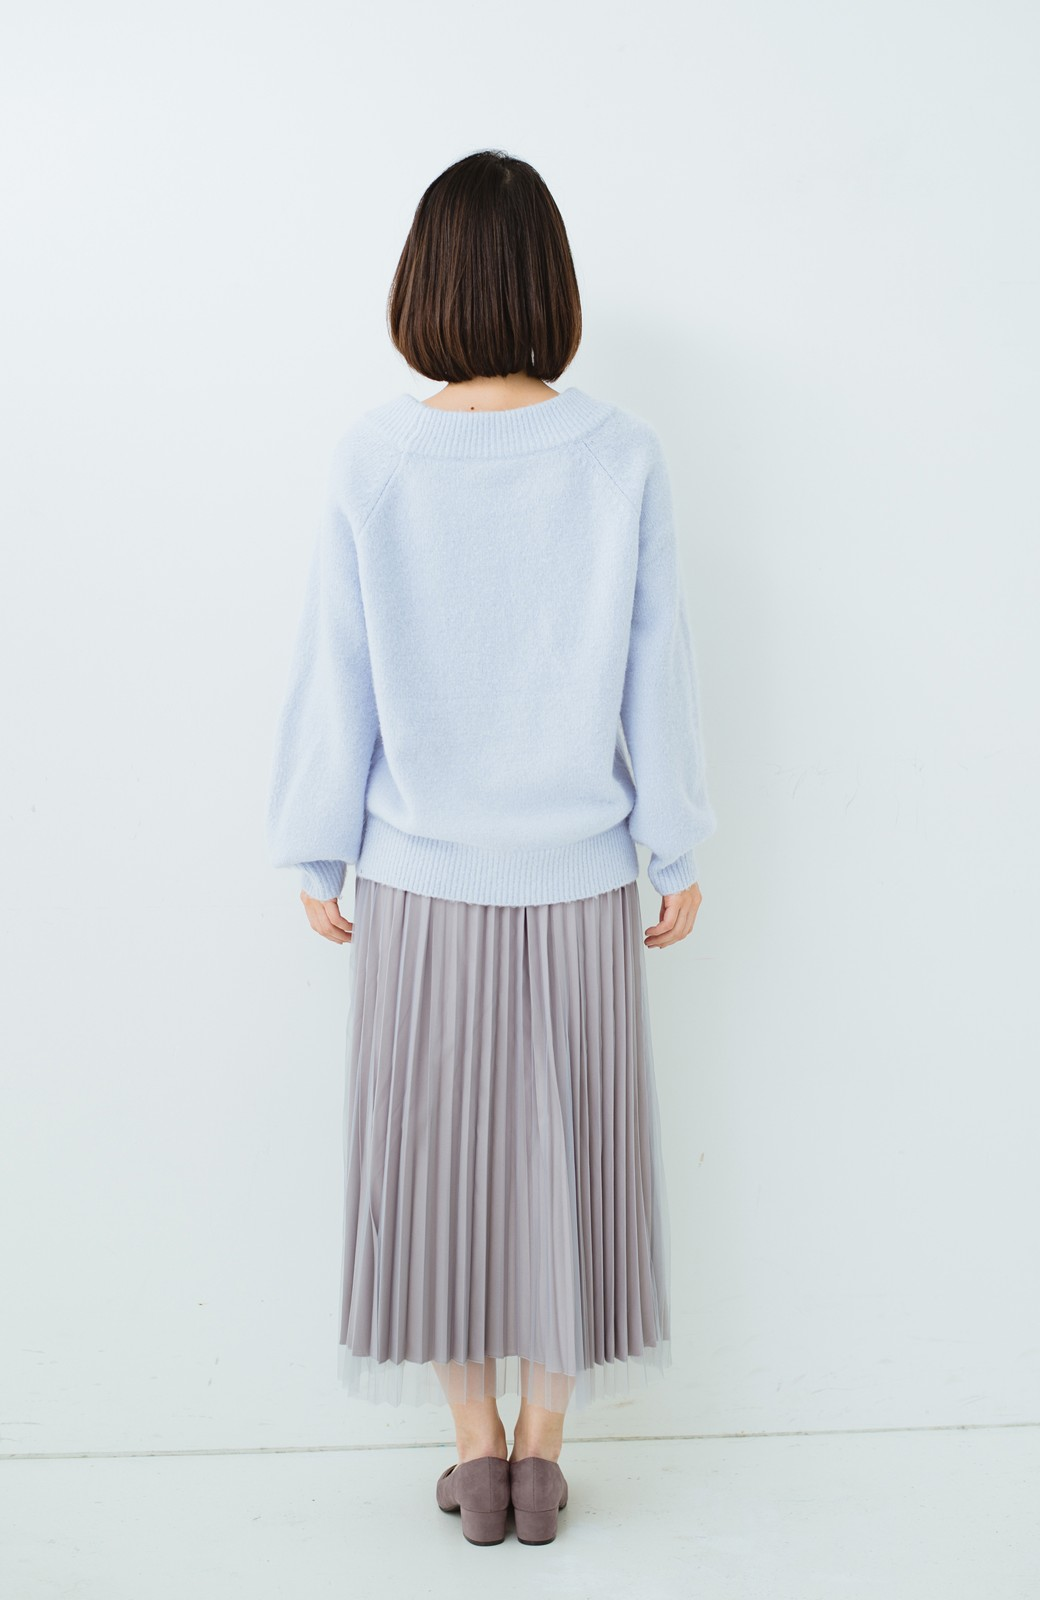 haco! どんな日も華やか気分にしてくれる 二枚仕立てのチュールプリーツスカート <ライトグレー>の商品写真23